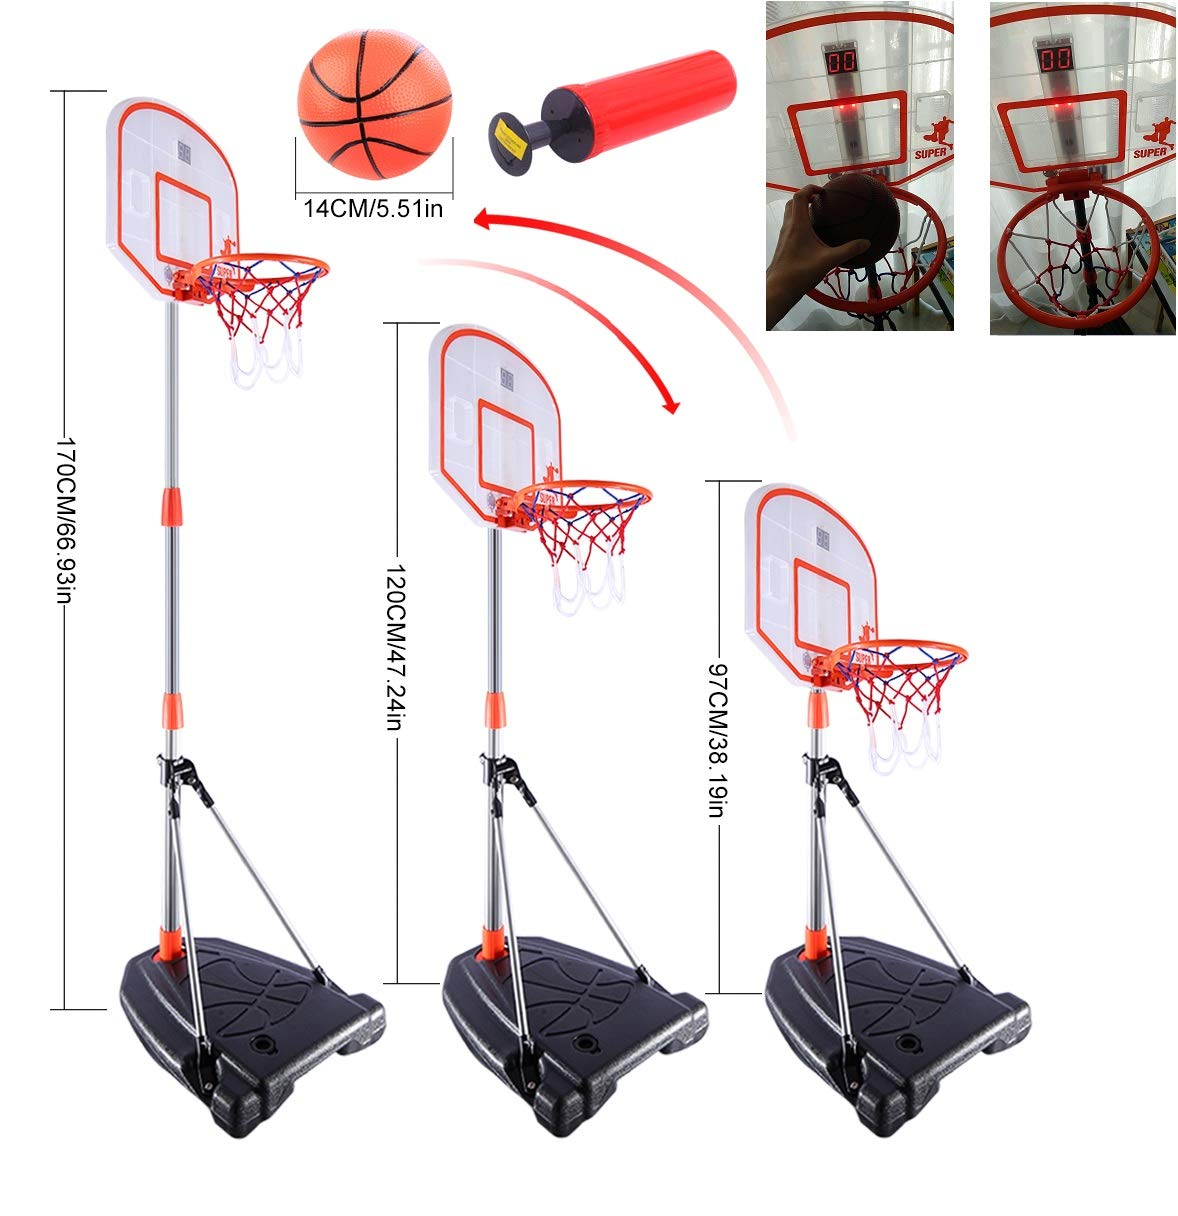 Mecotech Canasta Baloncesto Infantil, 97-170CM Ajustable Canasta ...